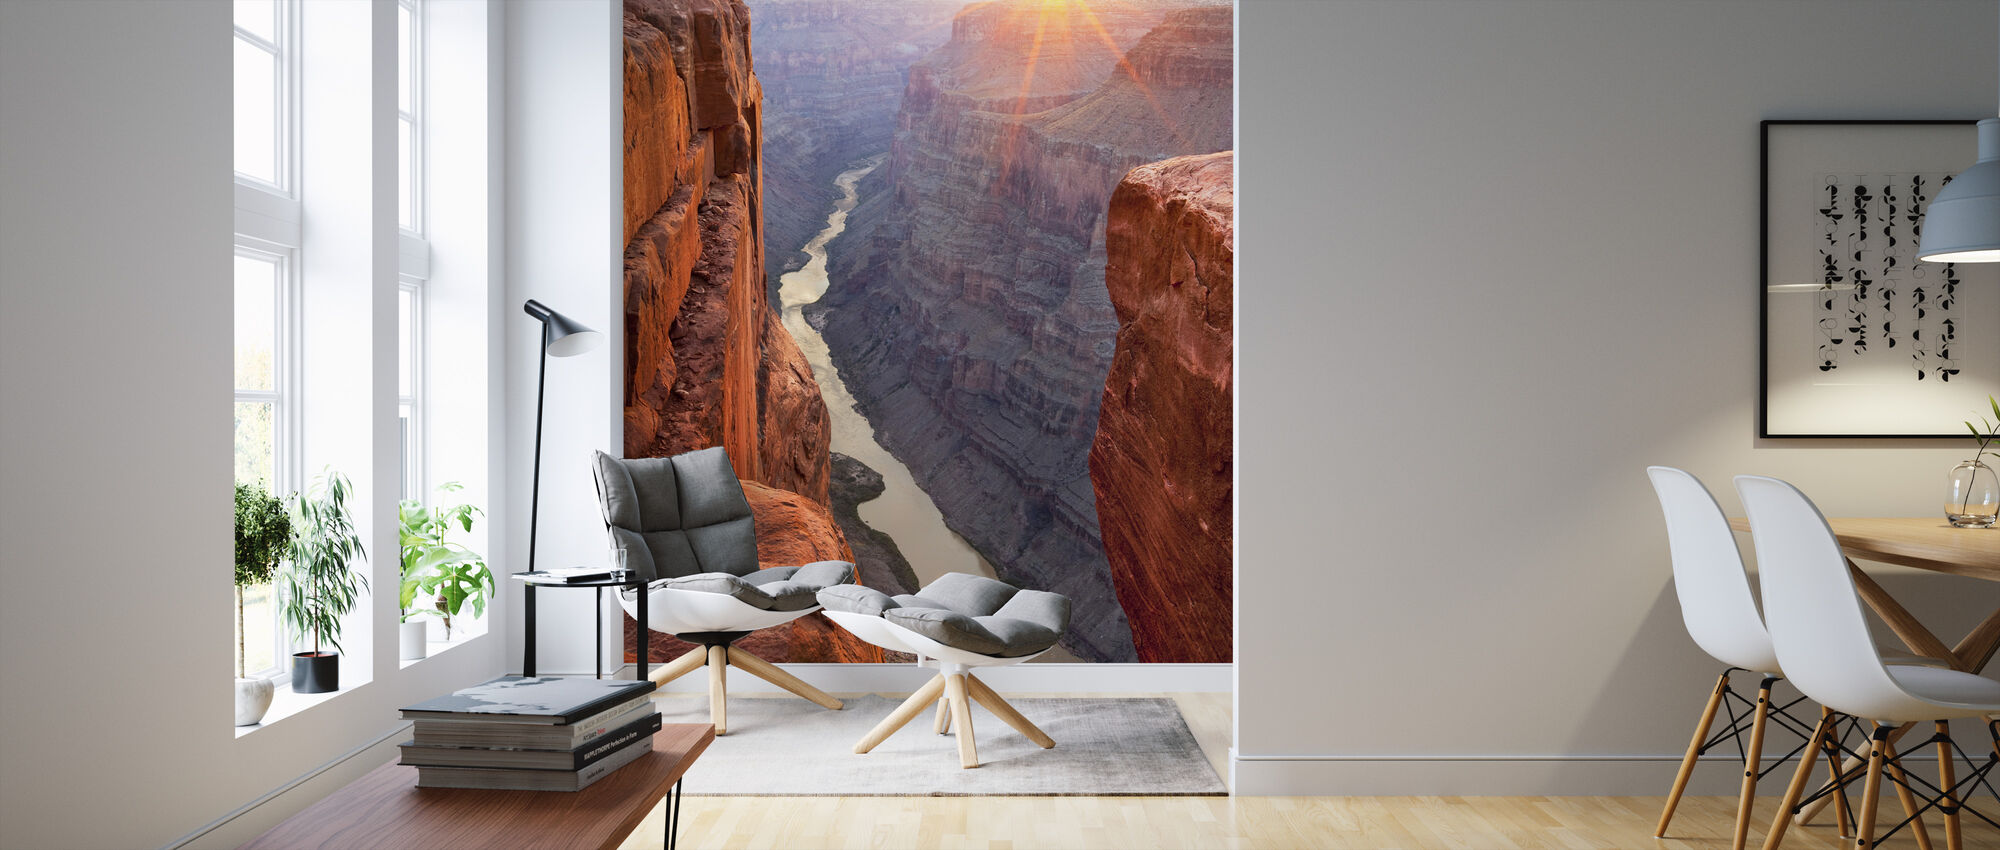 Sunrise Over the Grand Canyon, Arizona - Wallpaper - Living Room